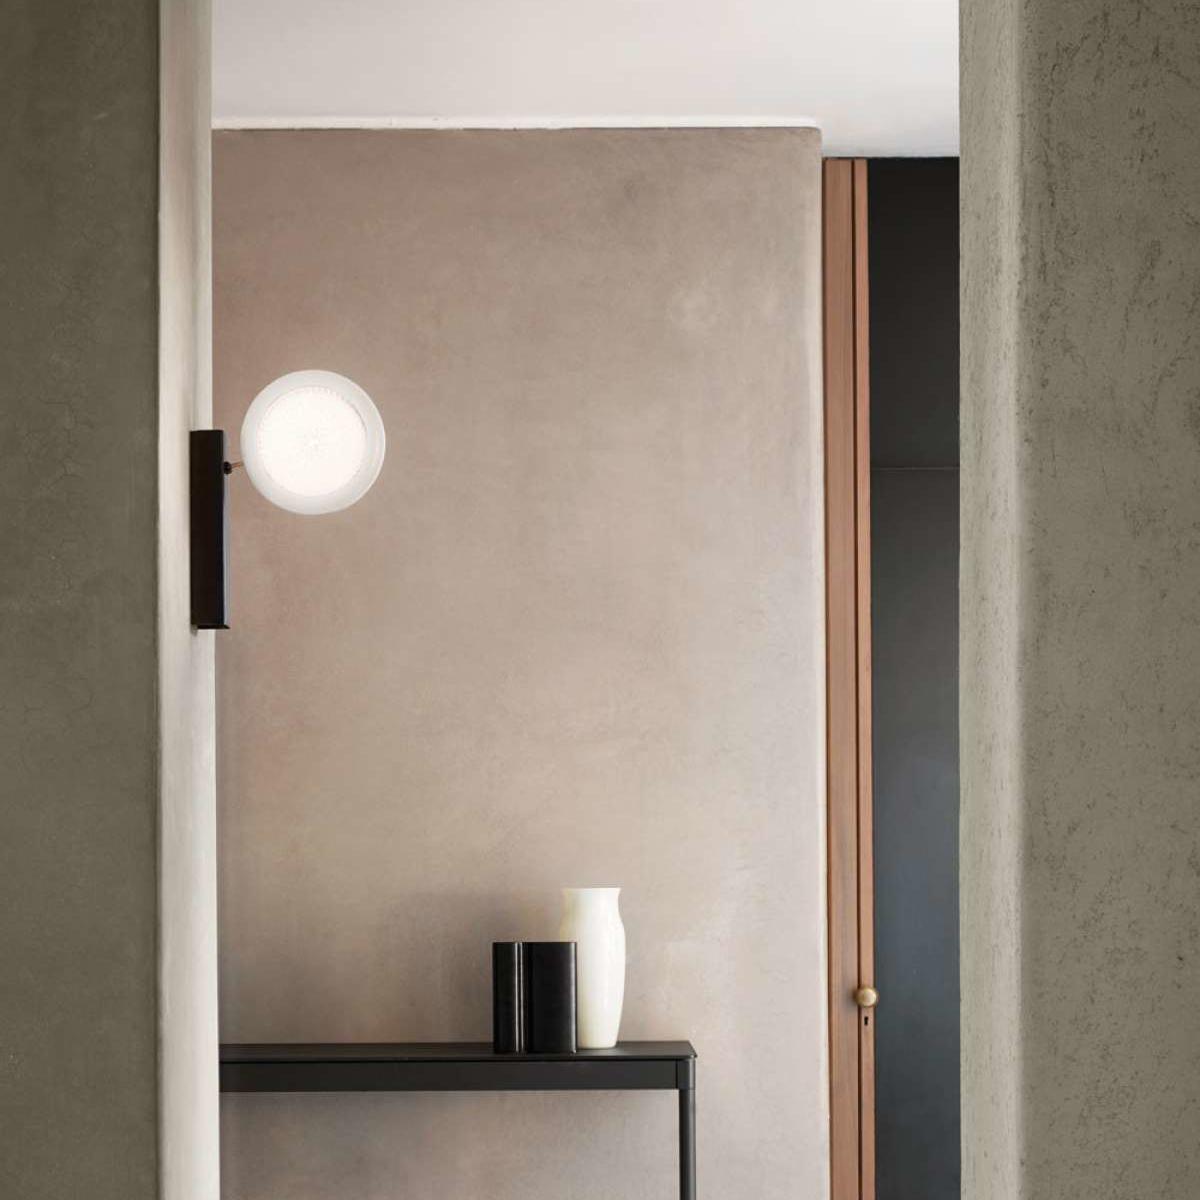 applique murale fly too d84a noir et blanc led 3000k 1546lm l20 5cm h48cm luceplan. Black Bedroom Furniture Sets. Home Design Ideas